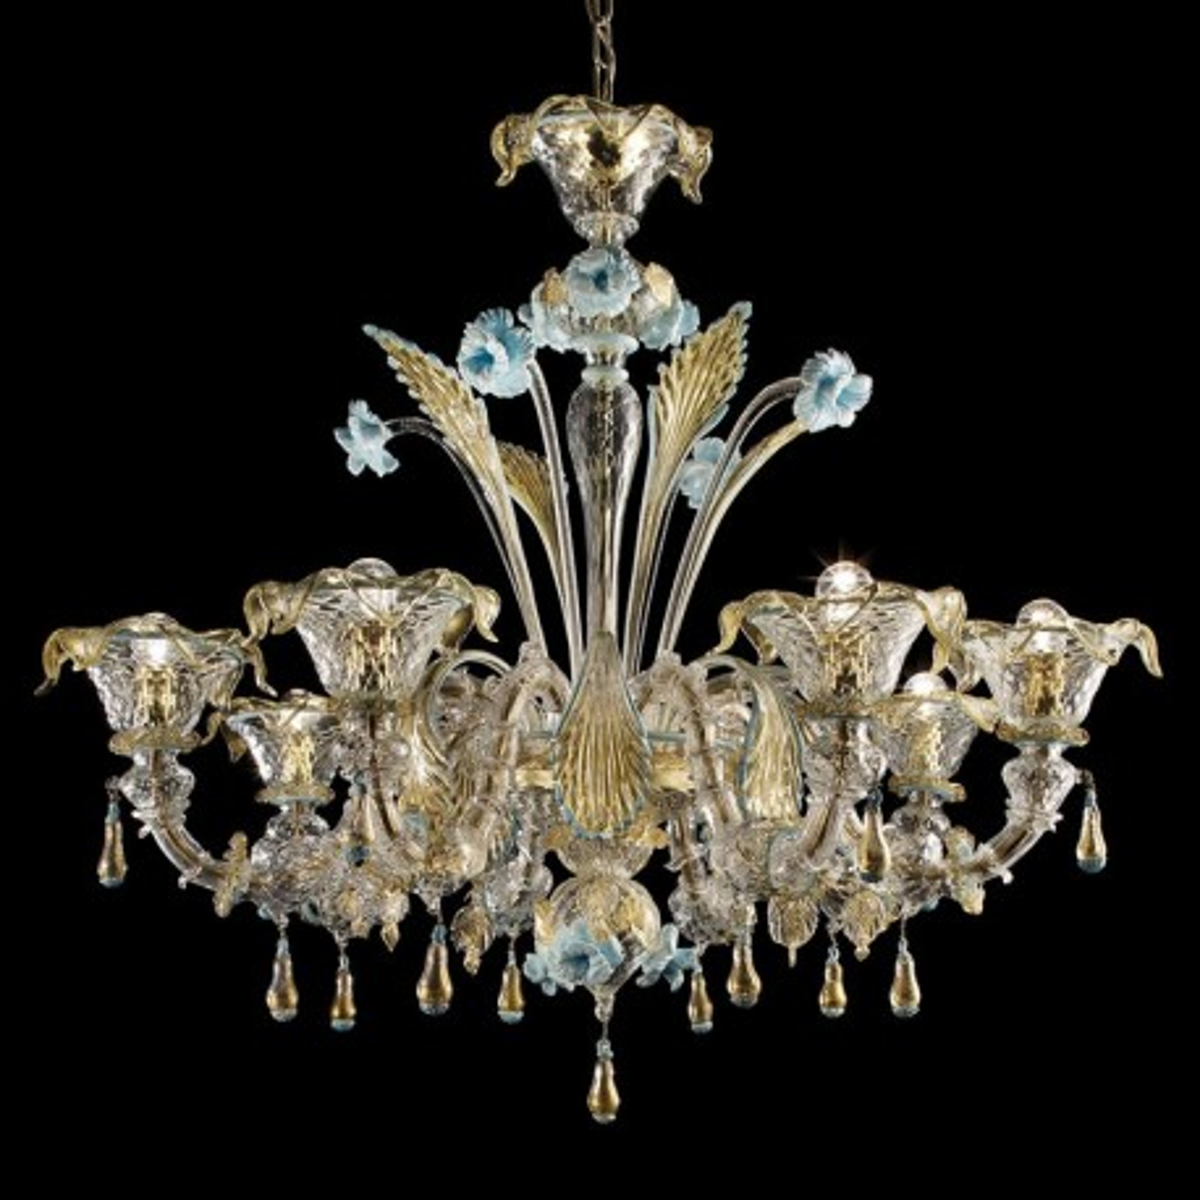 Primavera araña de cristal de Murano 8 luces - color transparente oro azul